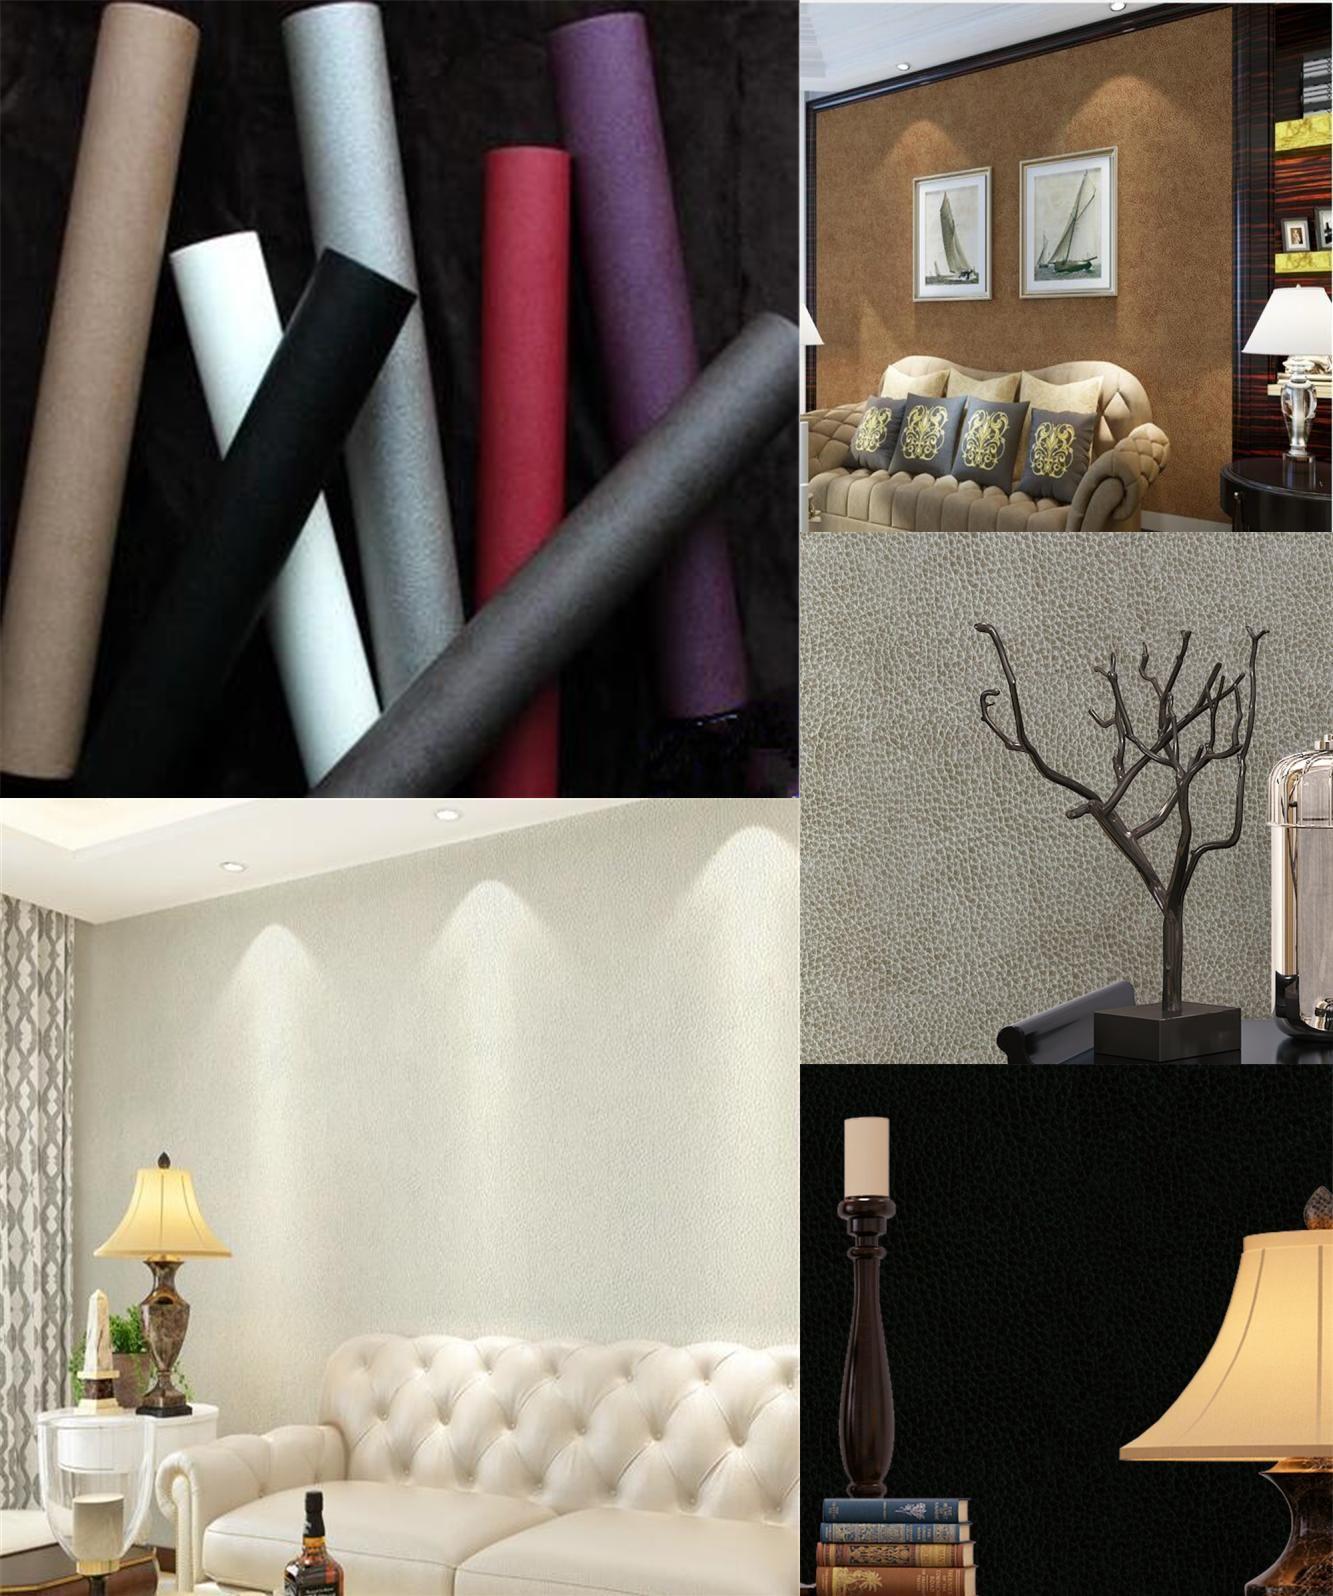 [Visit To Buy] Beibehang Simple Modern Fake Stripe Color